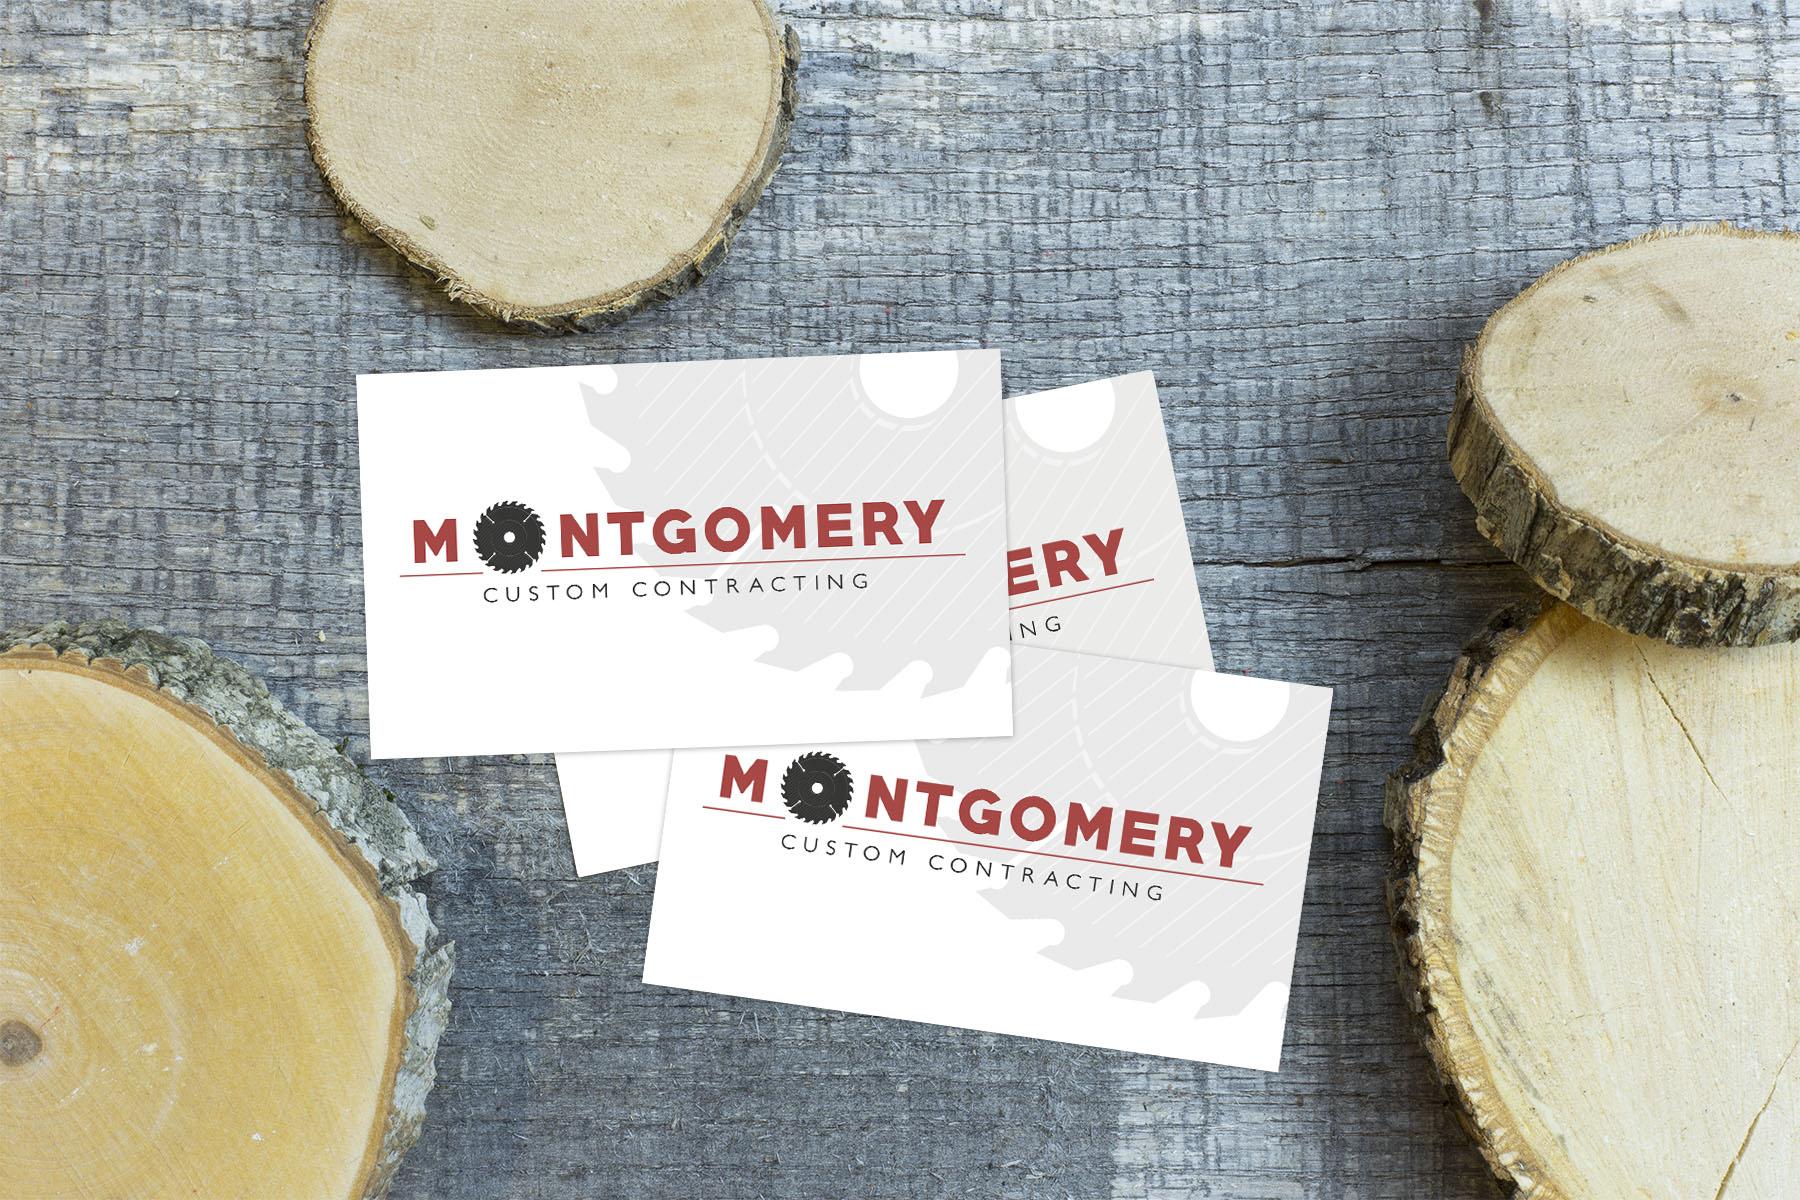 Montgomery-Custom-Contracting-Ottawa